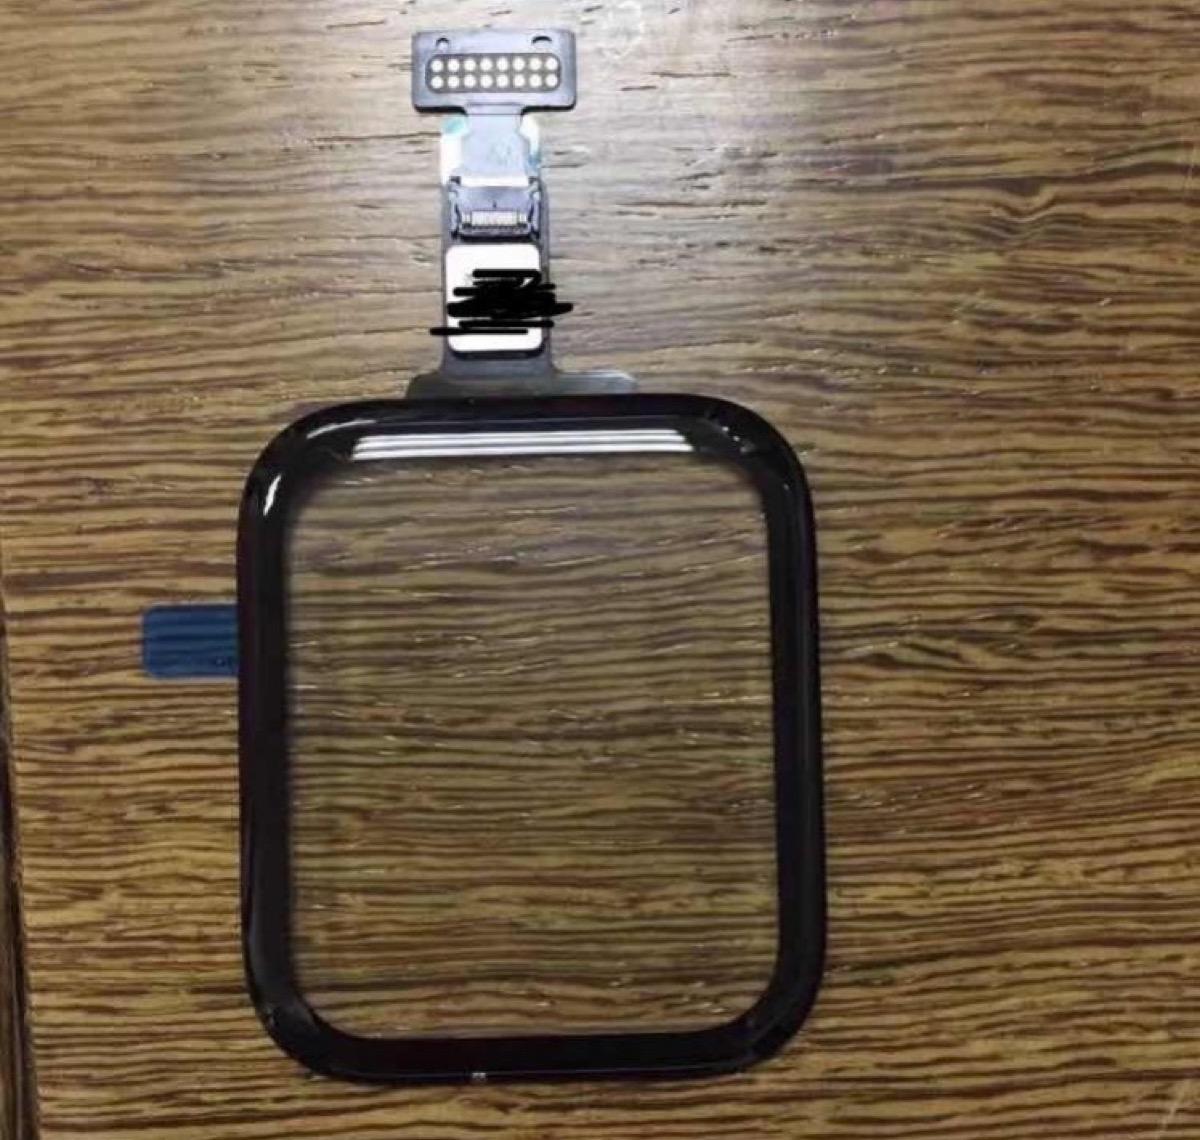 Apple Watch Series 4 Ekran Paneli